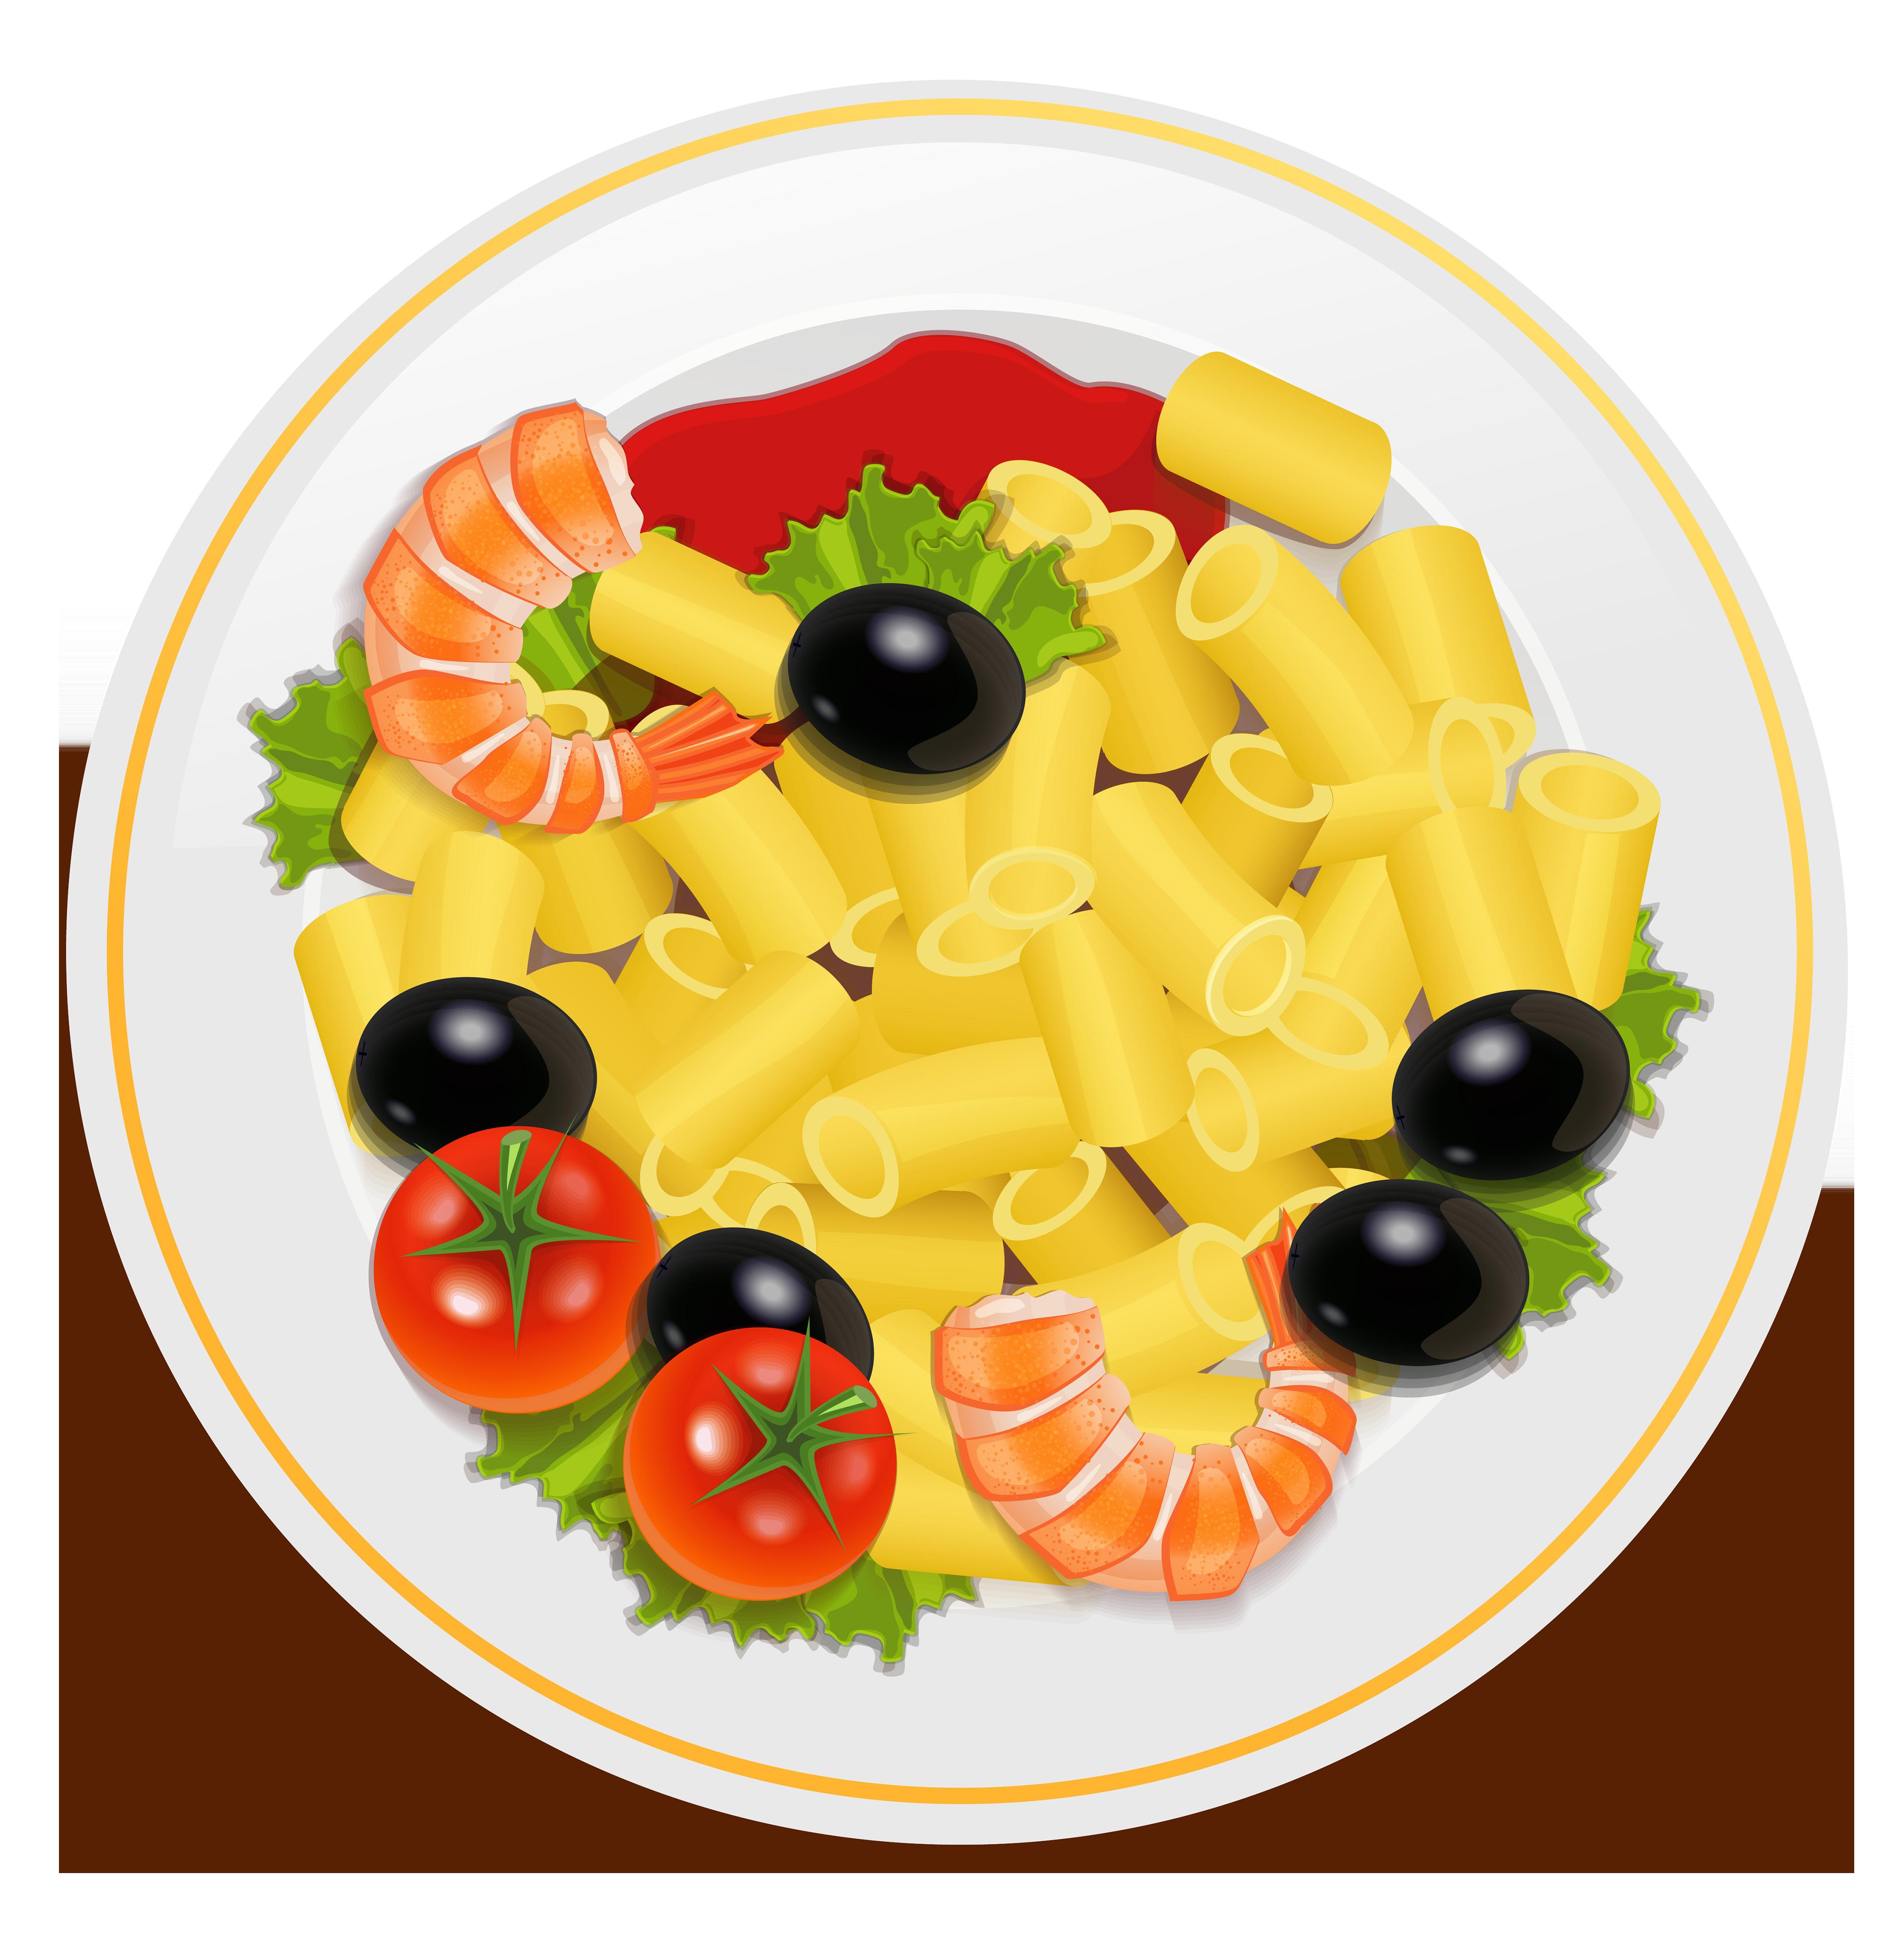 Macaroni clipart pasta salad Salad Macaroni clipart Clip Art